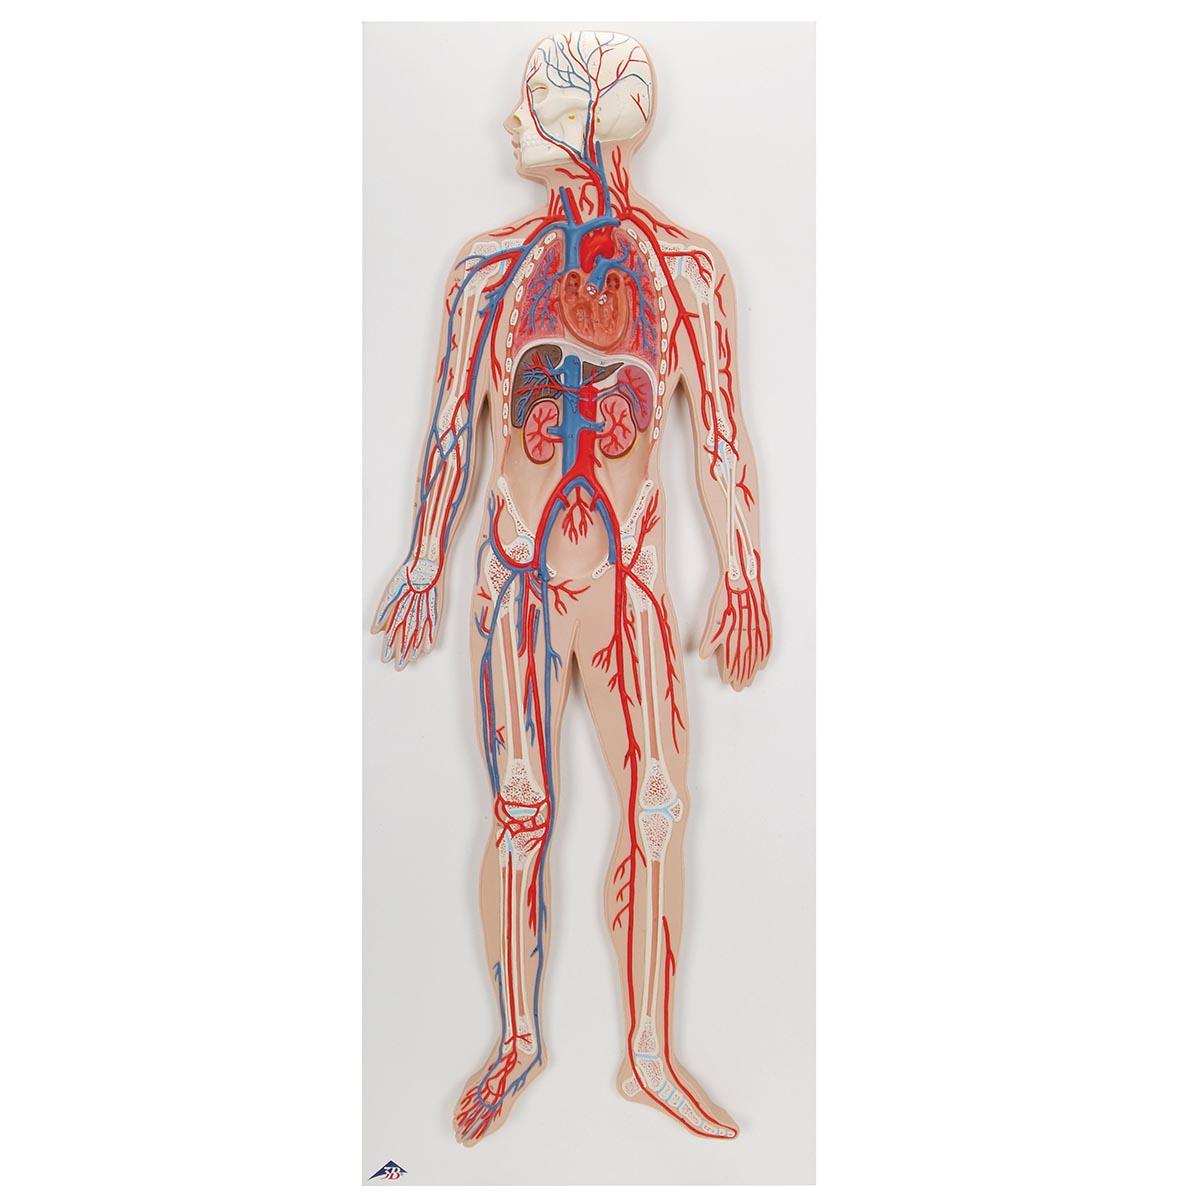 Sistemacirculatoriohumano 2nd